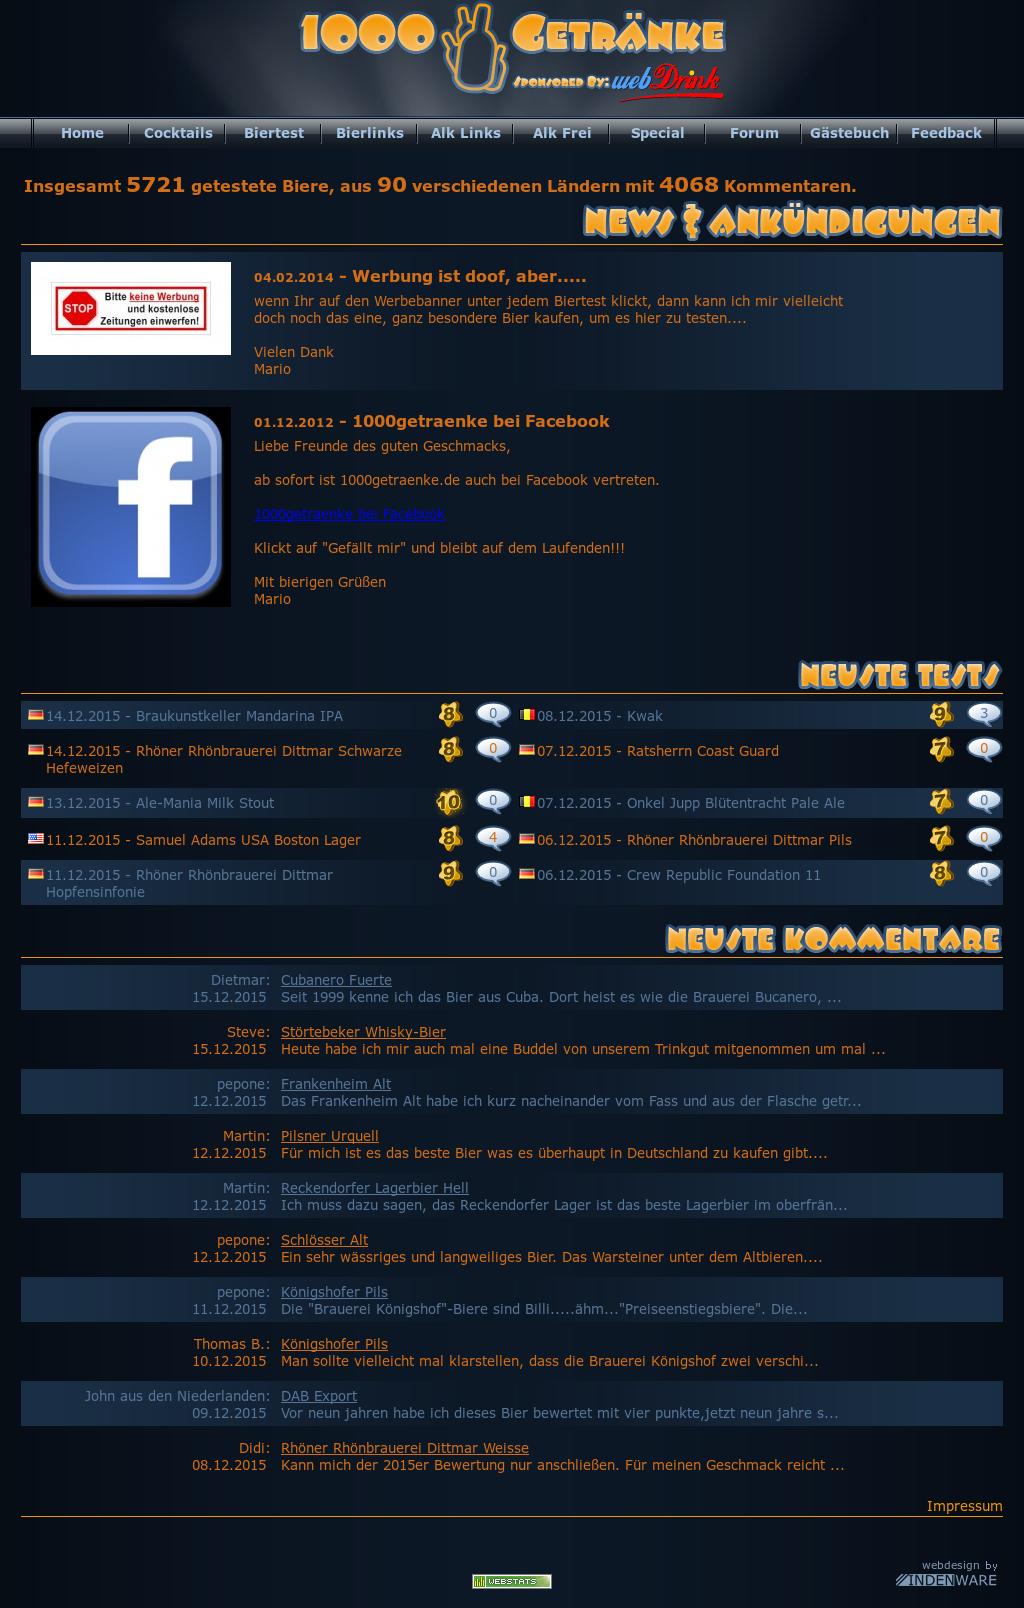 1000getraenke.de Competitors, Revenue and Employees - Owler Company ...